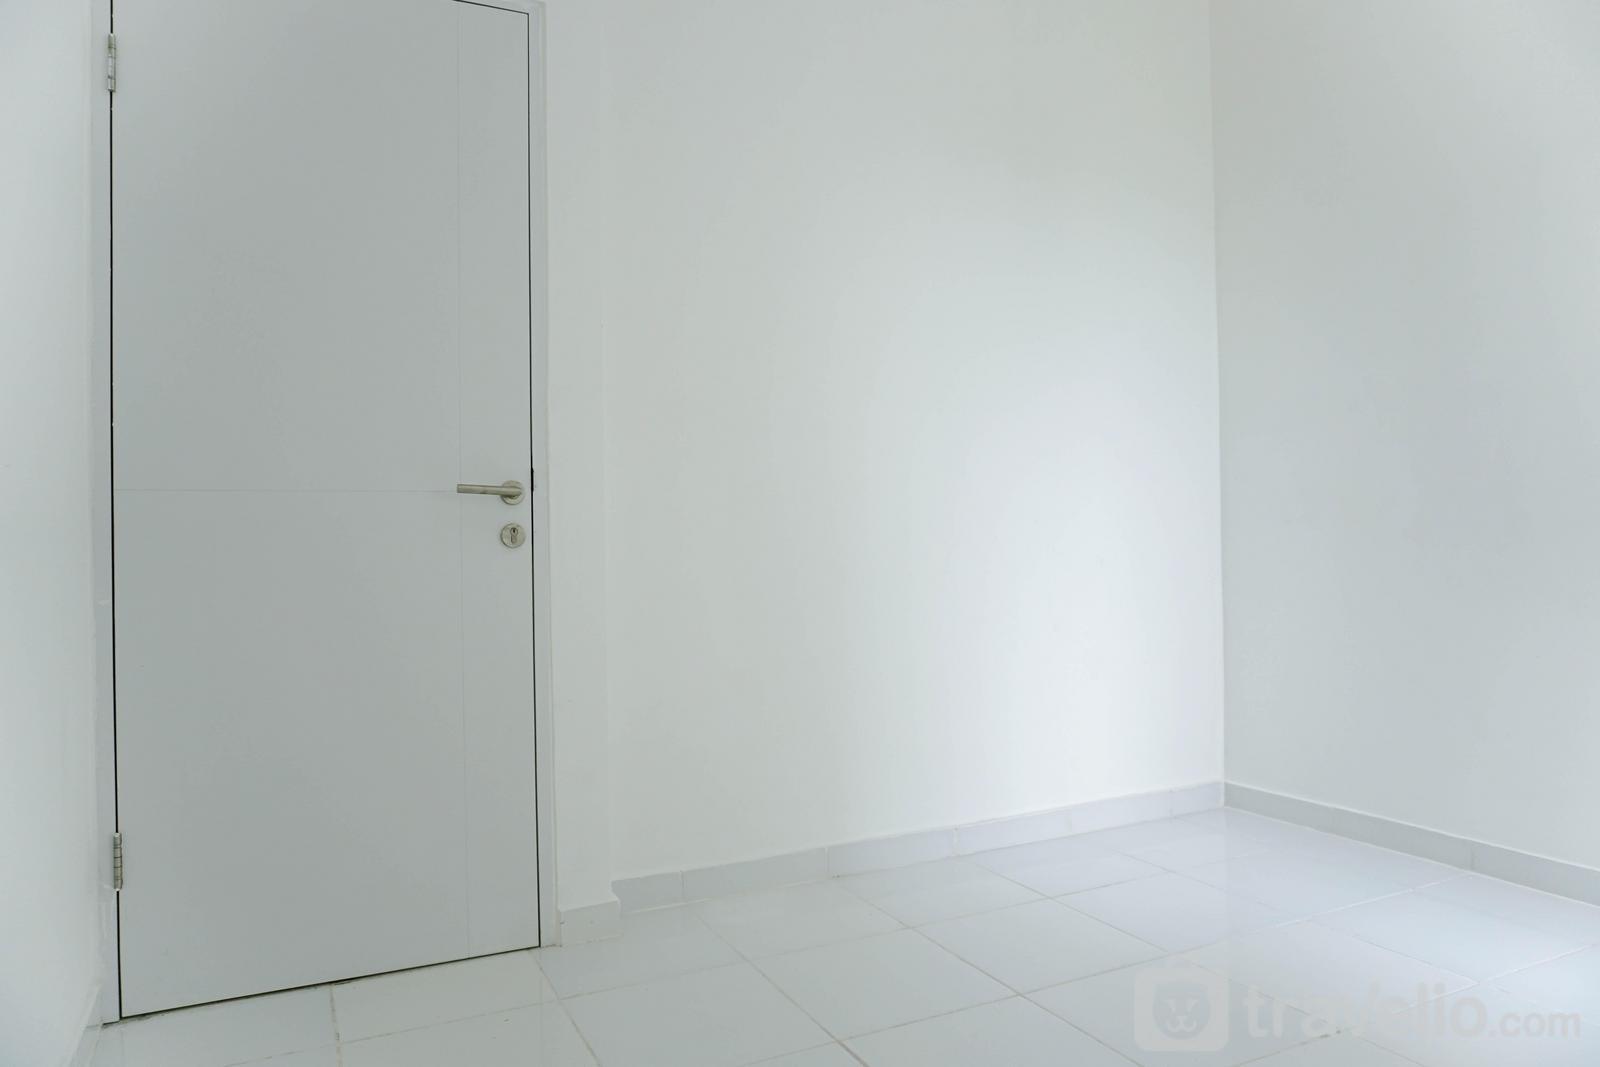 Apartemen Aeropolis Residence - Unfurnished Studio Apartment Aeropolis Residence with AC near Airport By Travelio